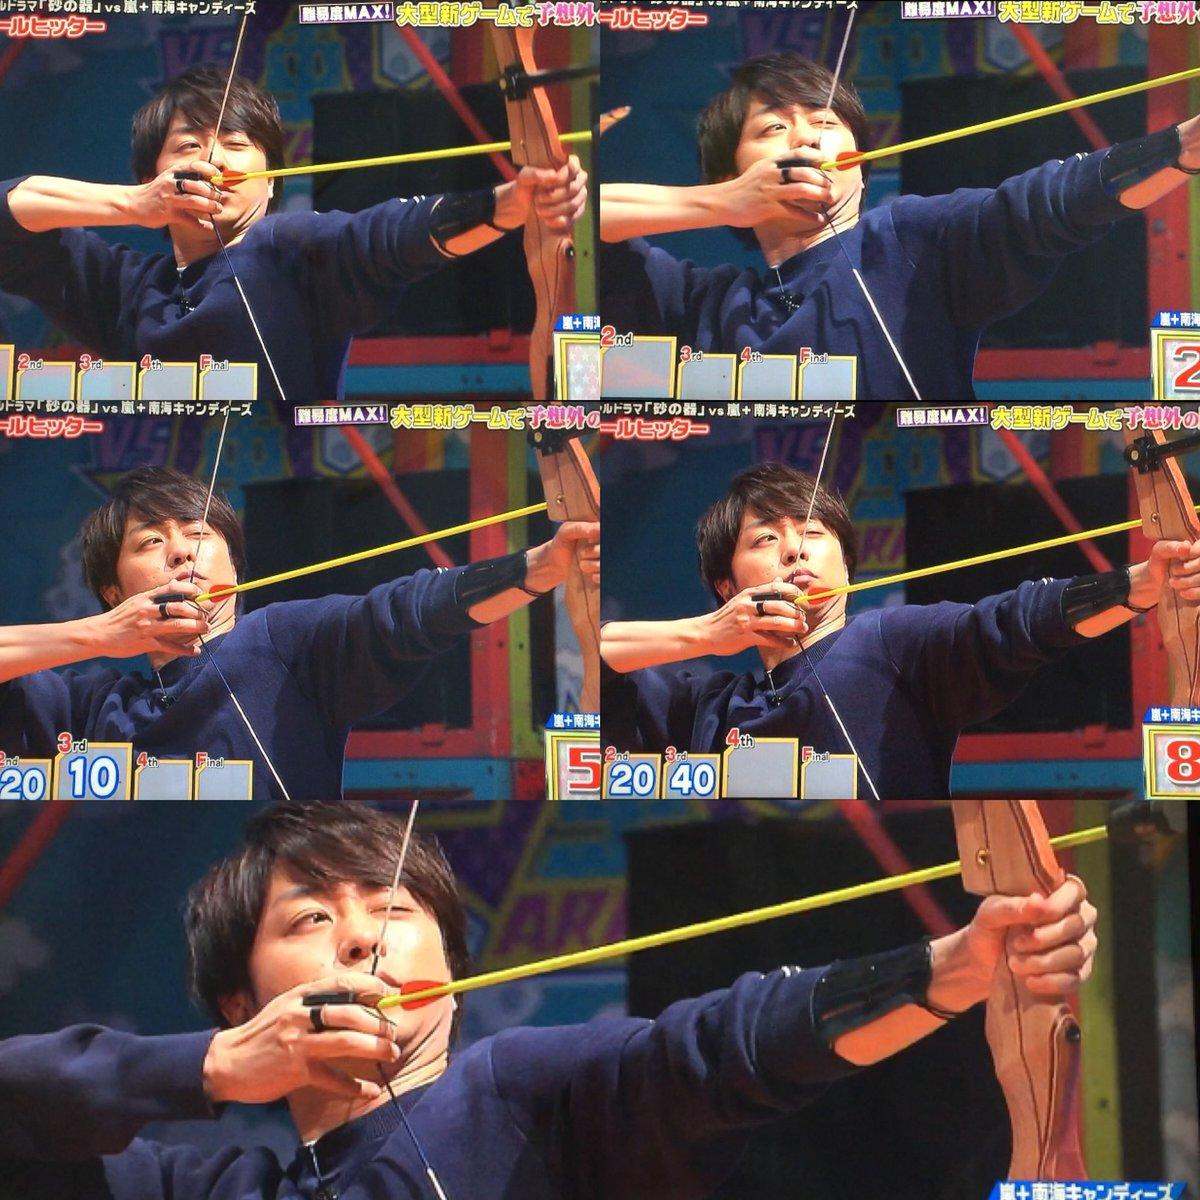 D2vdc1qUYAEHxn  - 2019年3月28日 #嵐 Twitterまとめ01